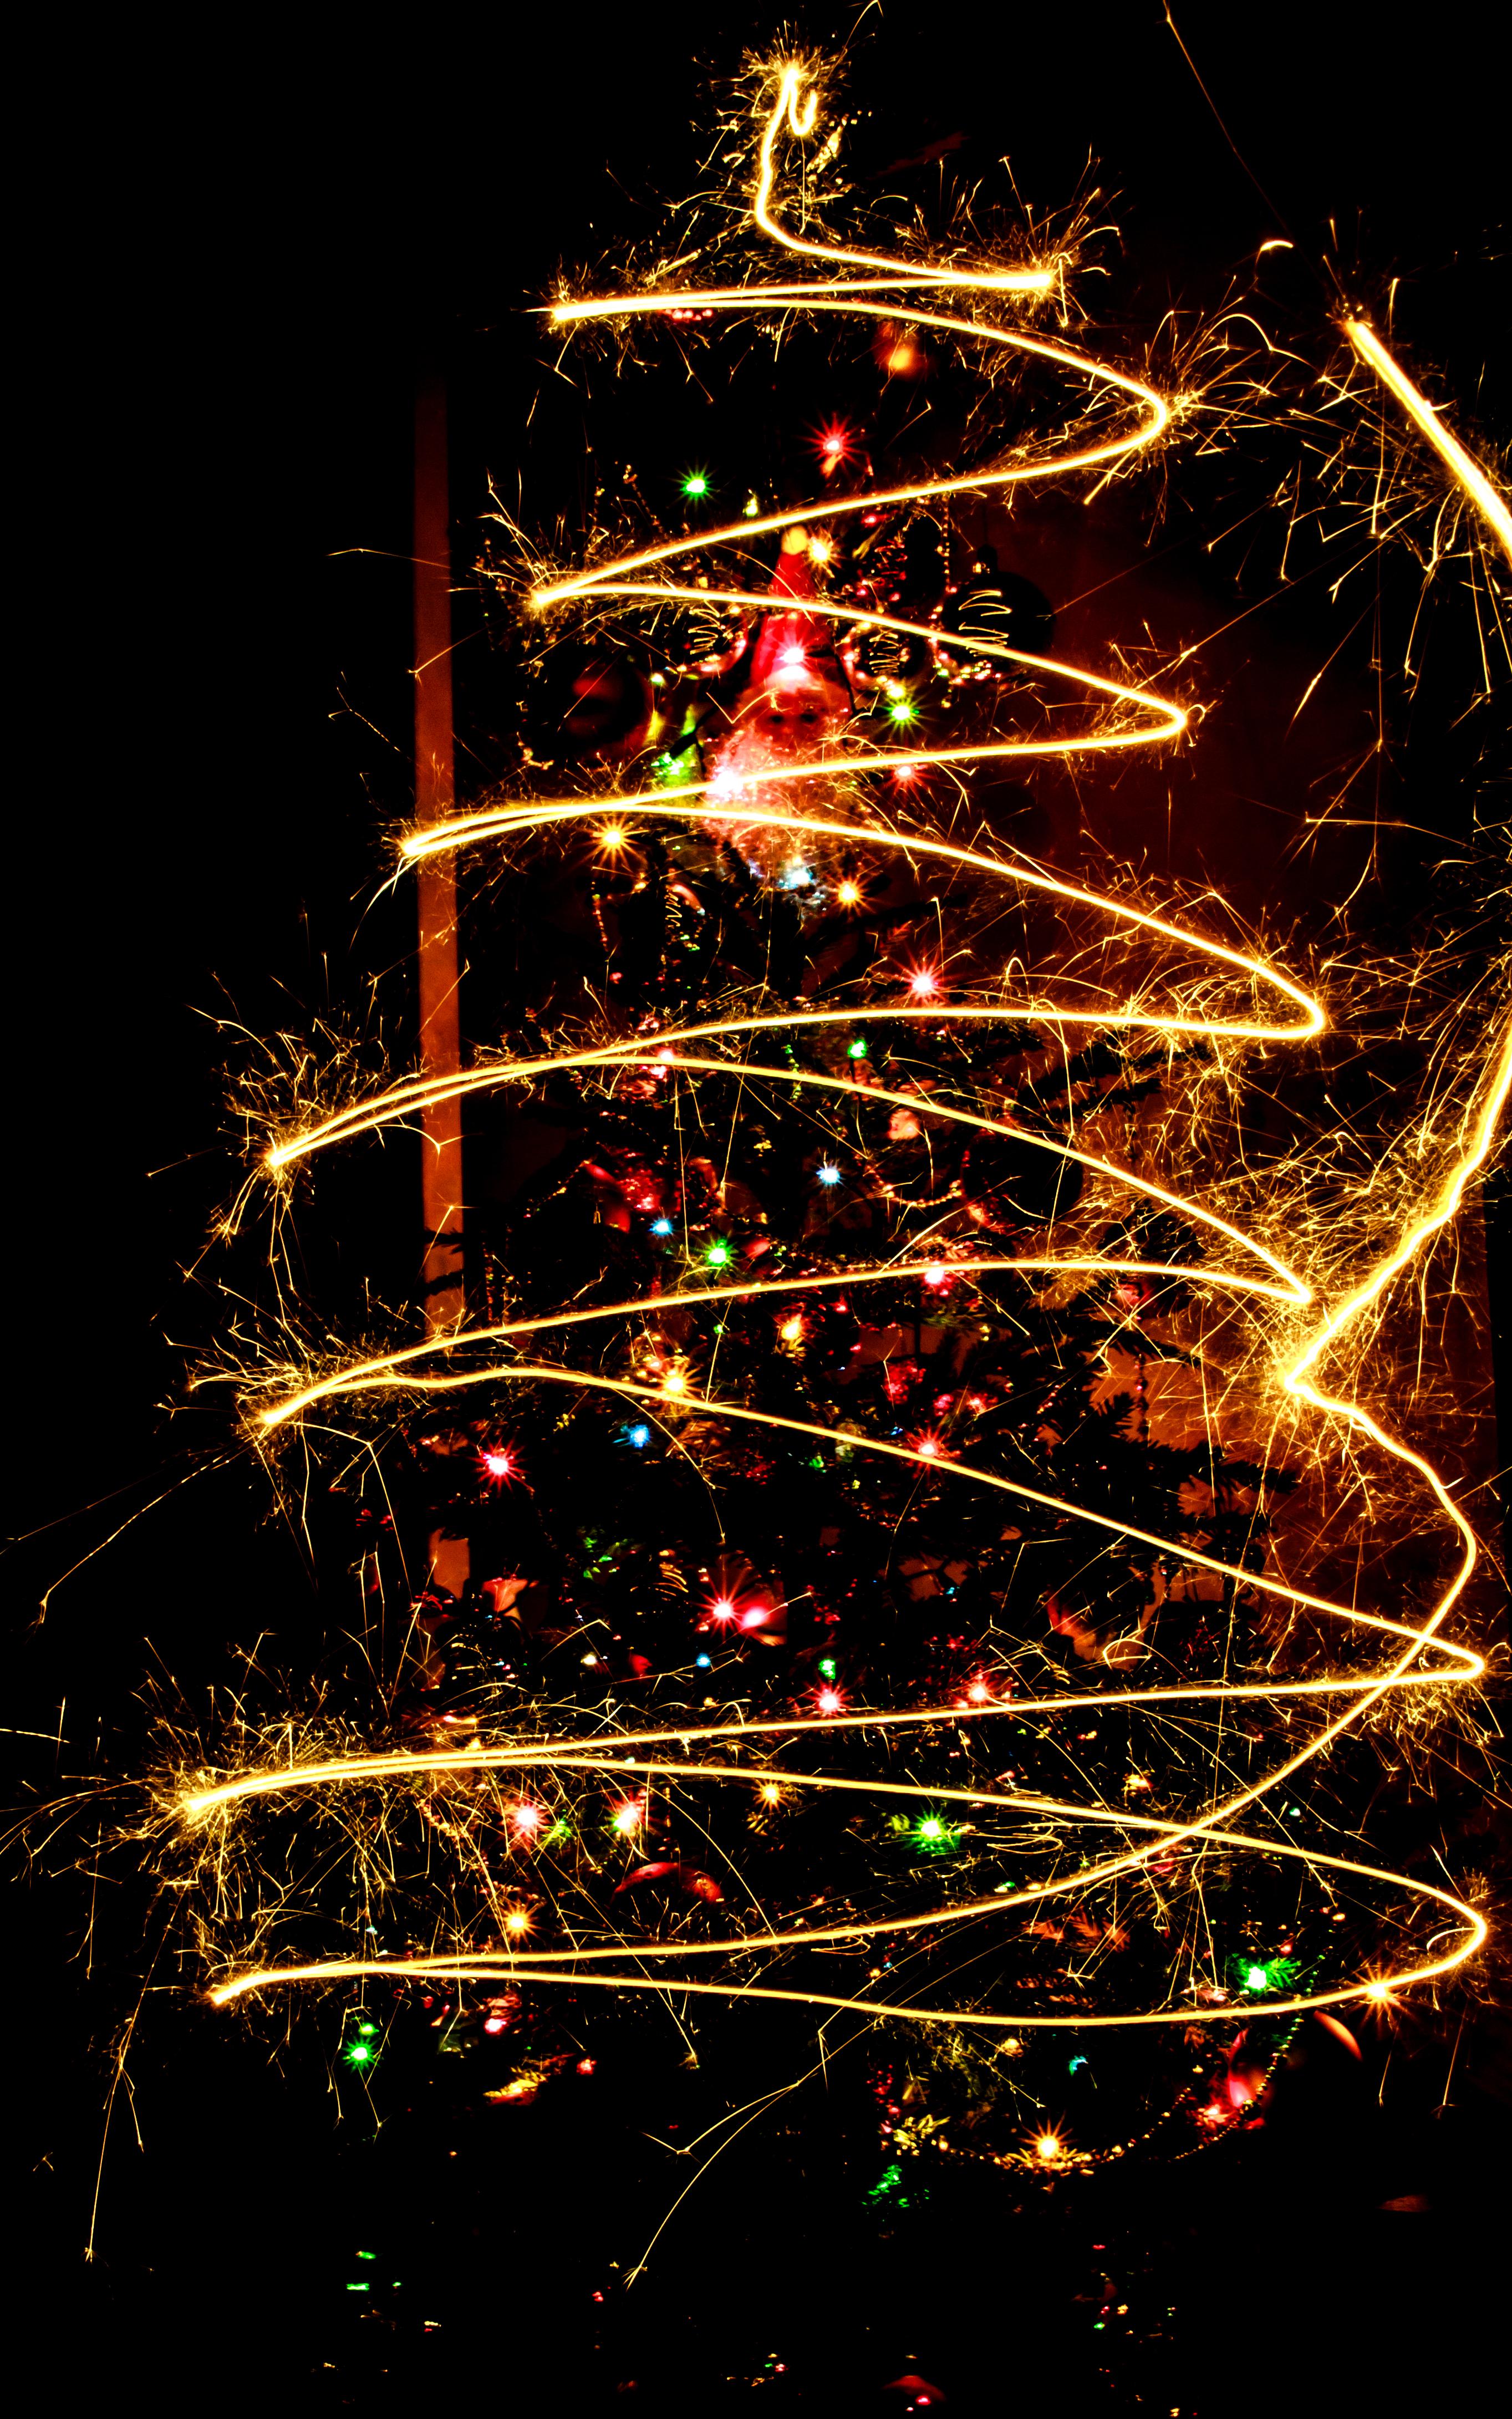 free download - Celebration Christmas Lights